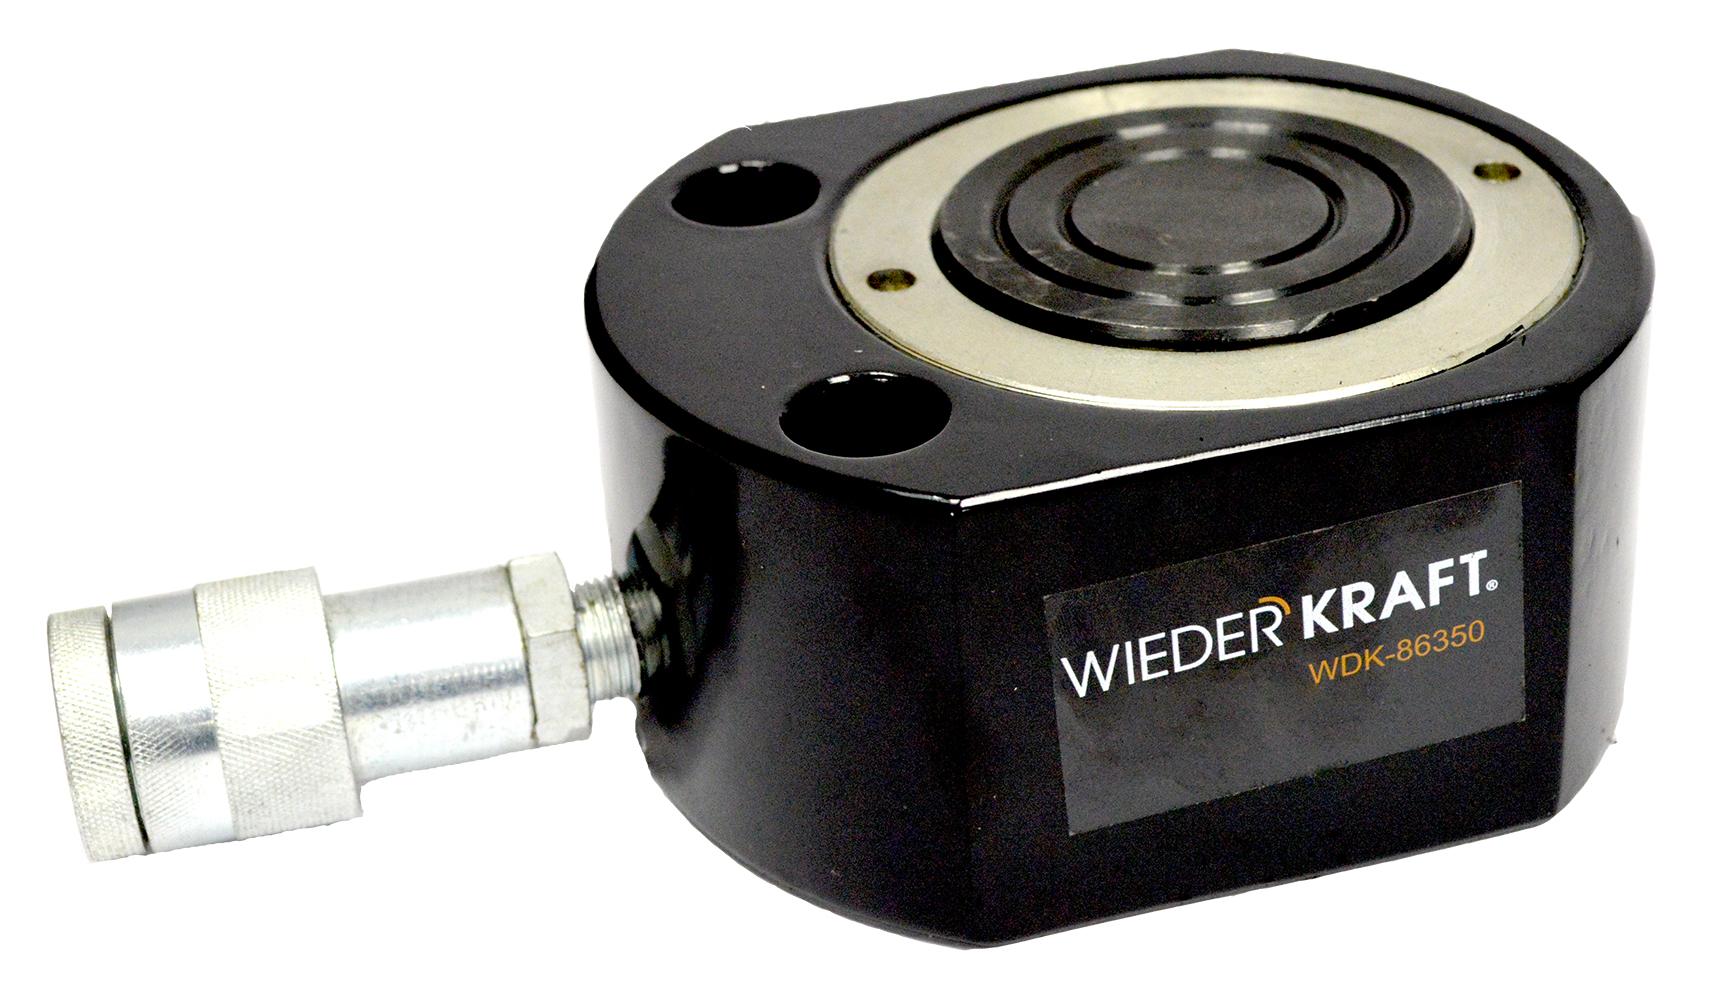 Домкрат Wiederkraft Wdk-86350 домкрат wiederkraft wdk 80203x